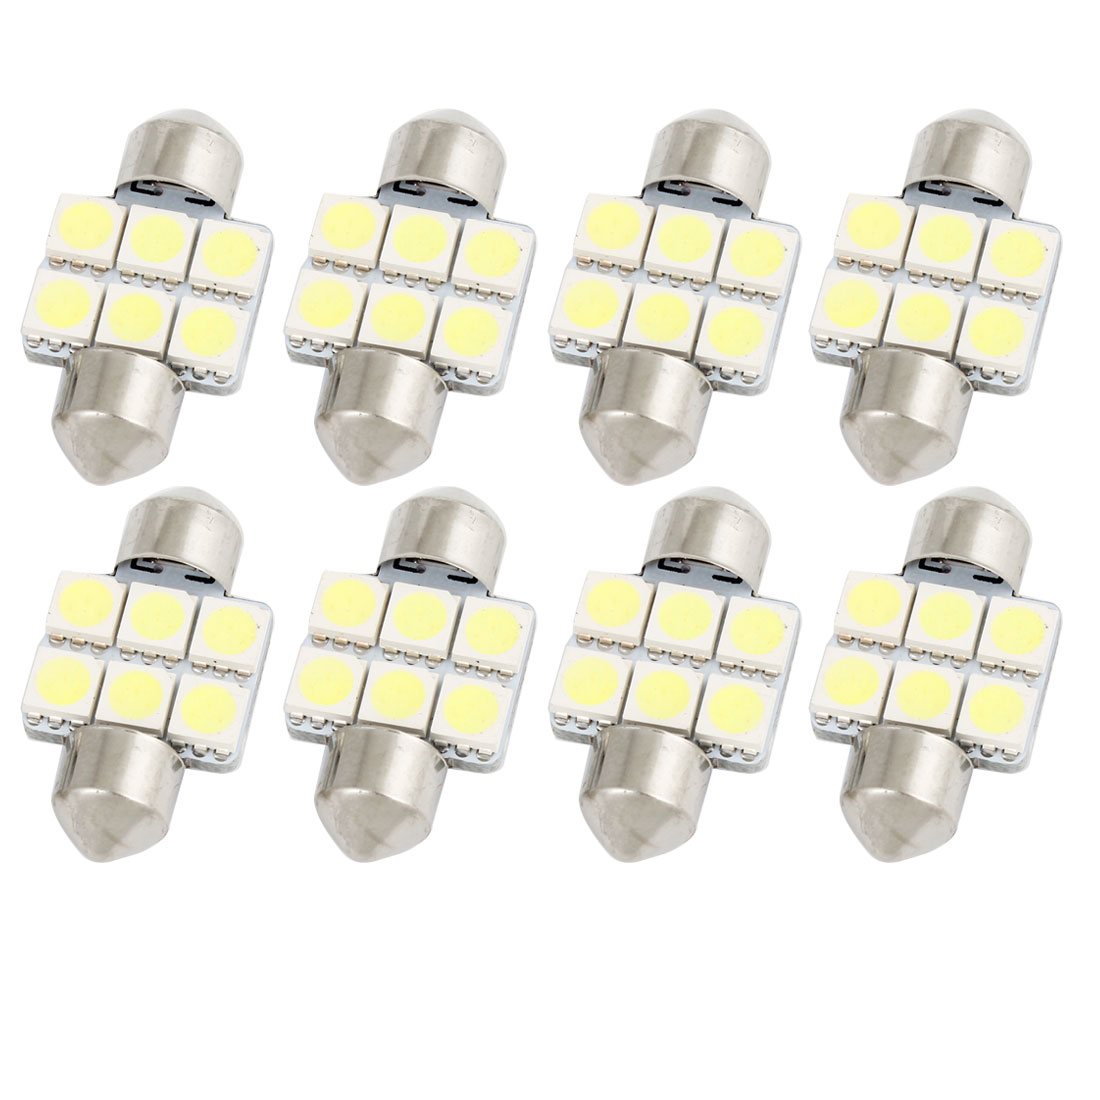 8Pcs 31mm 5050 SMD 6 LED White Festoon Dome Map Reading Light 3175 3022 3021 Internal